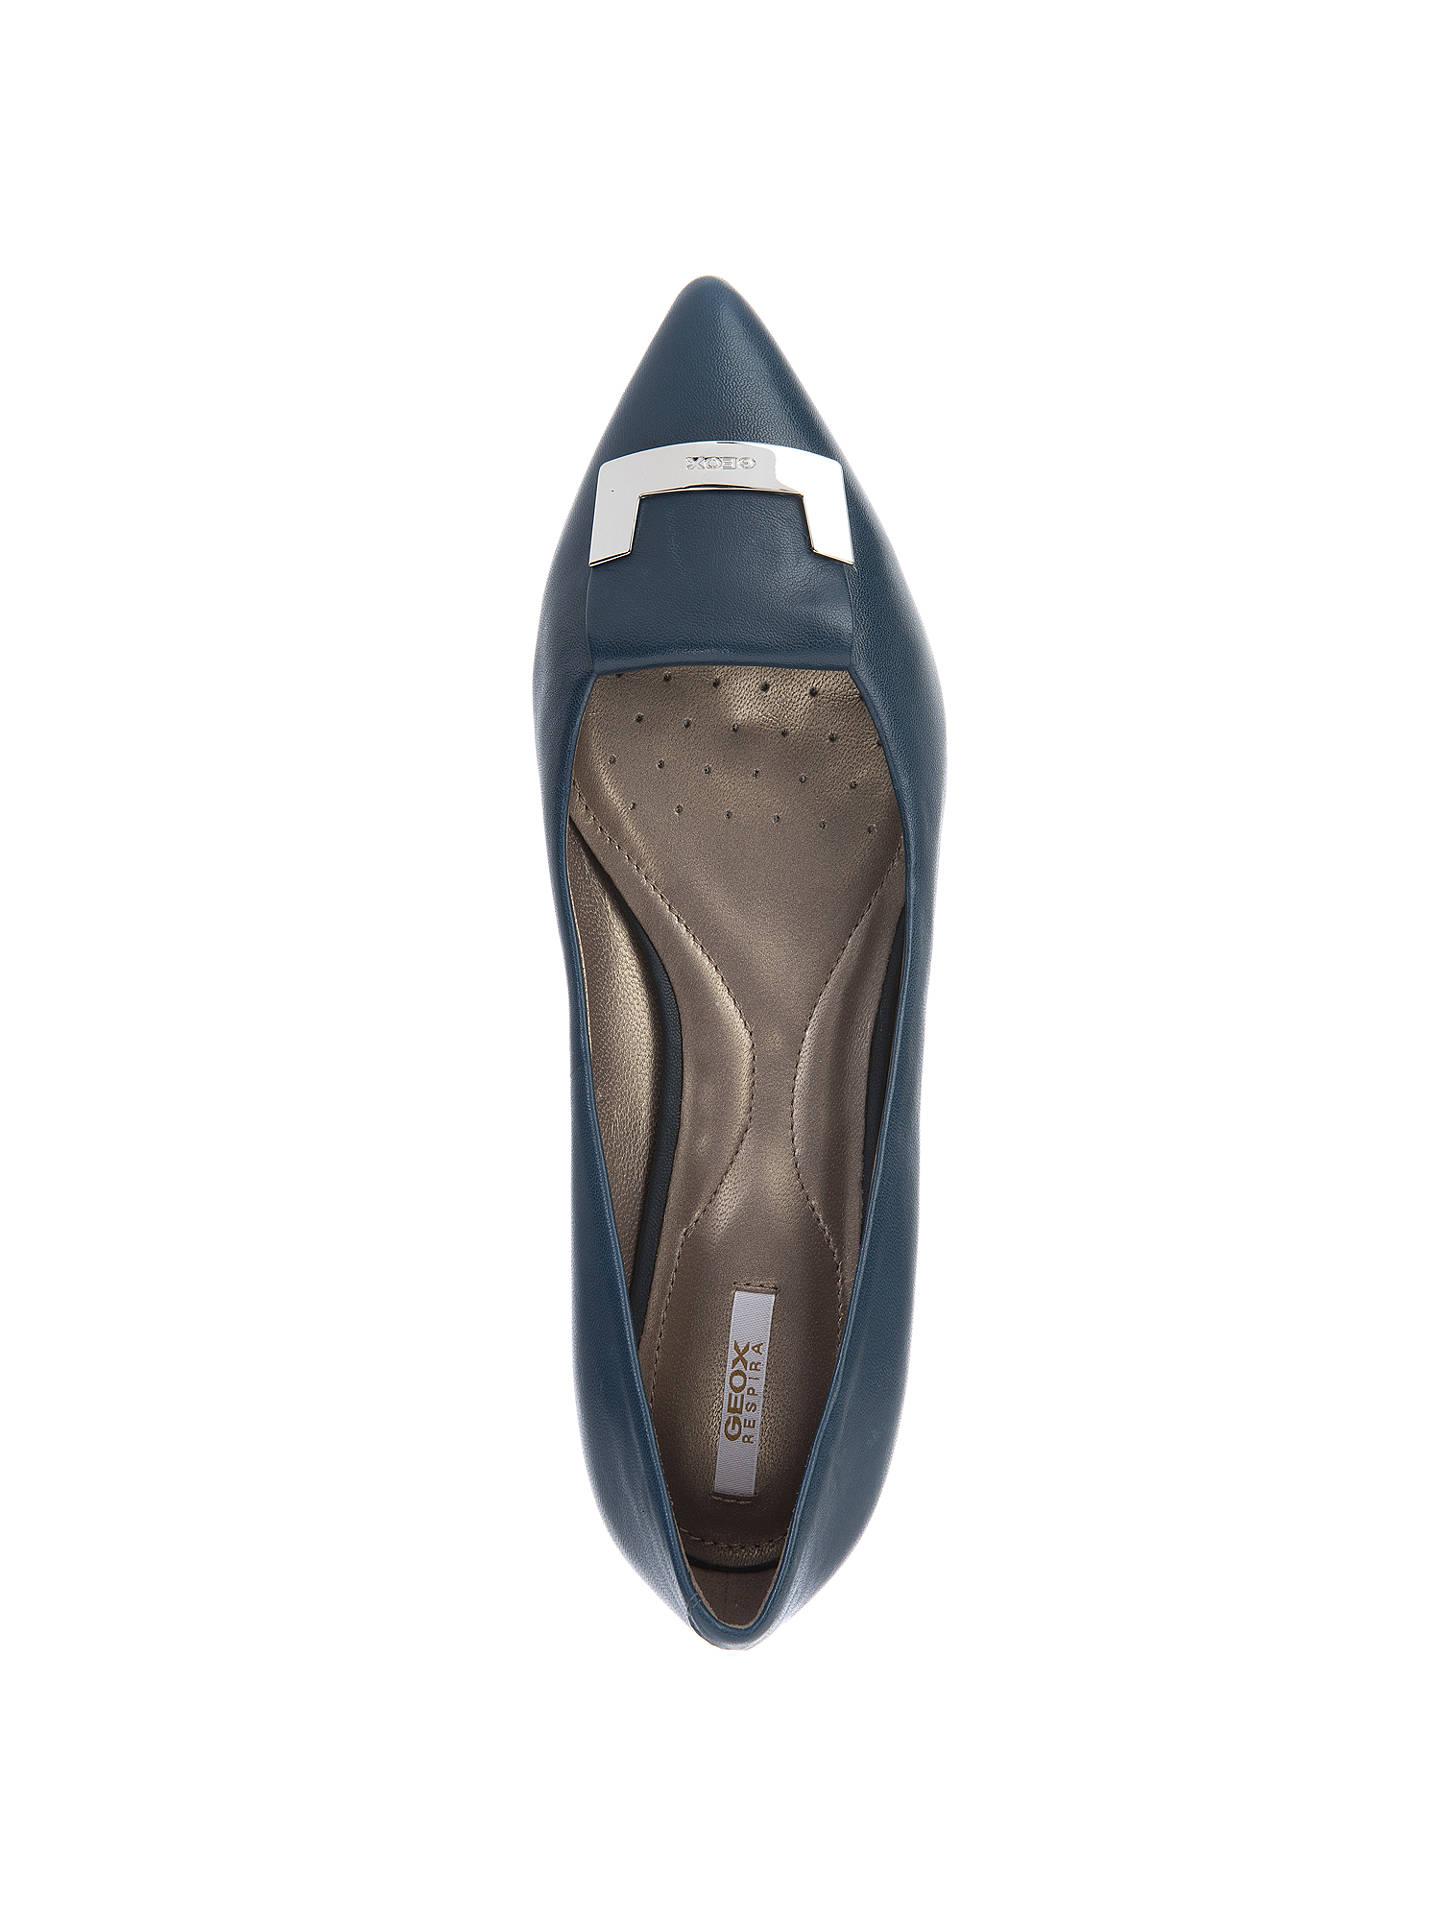 ab40fb9bdb1ad ... Buy Geox Rhosyn Flat Low Heeled Toe Pointed Pumps, Ocean Blue Leather,  5 Online ...